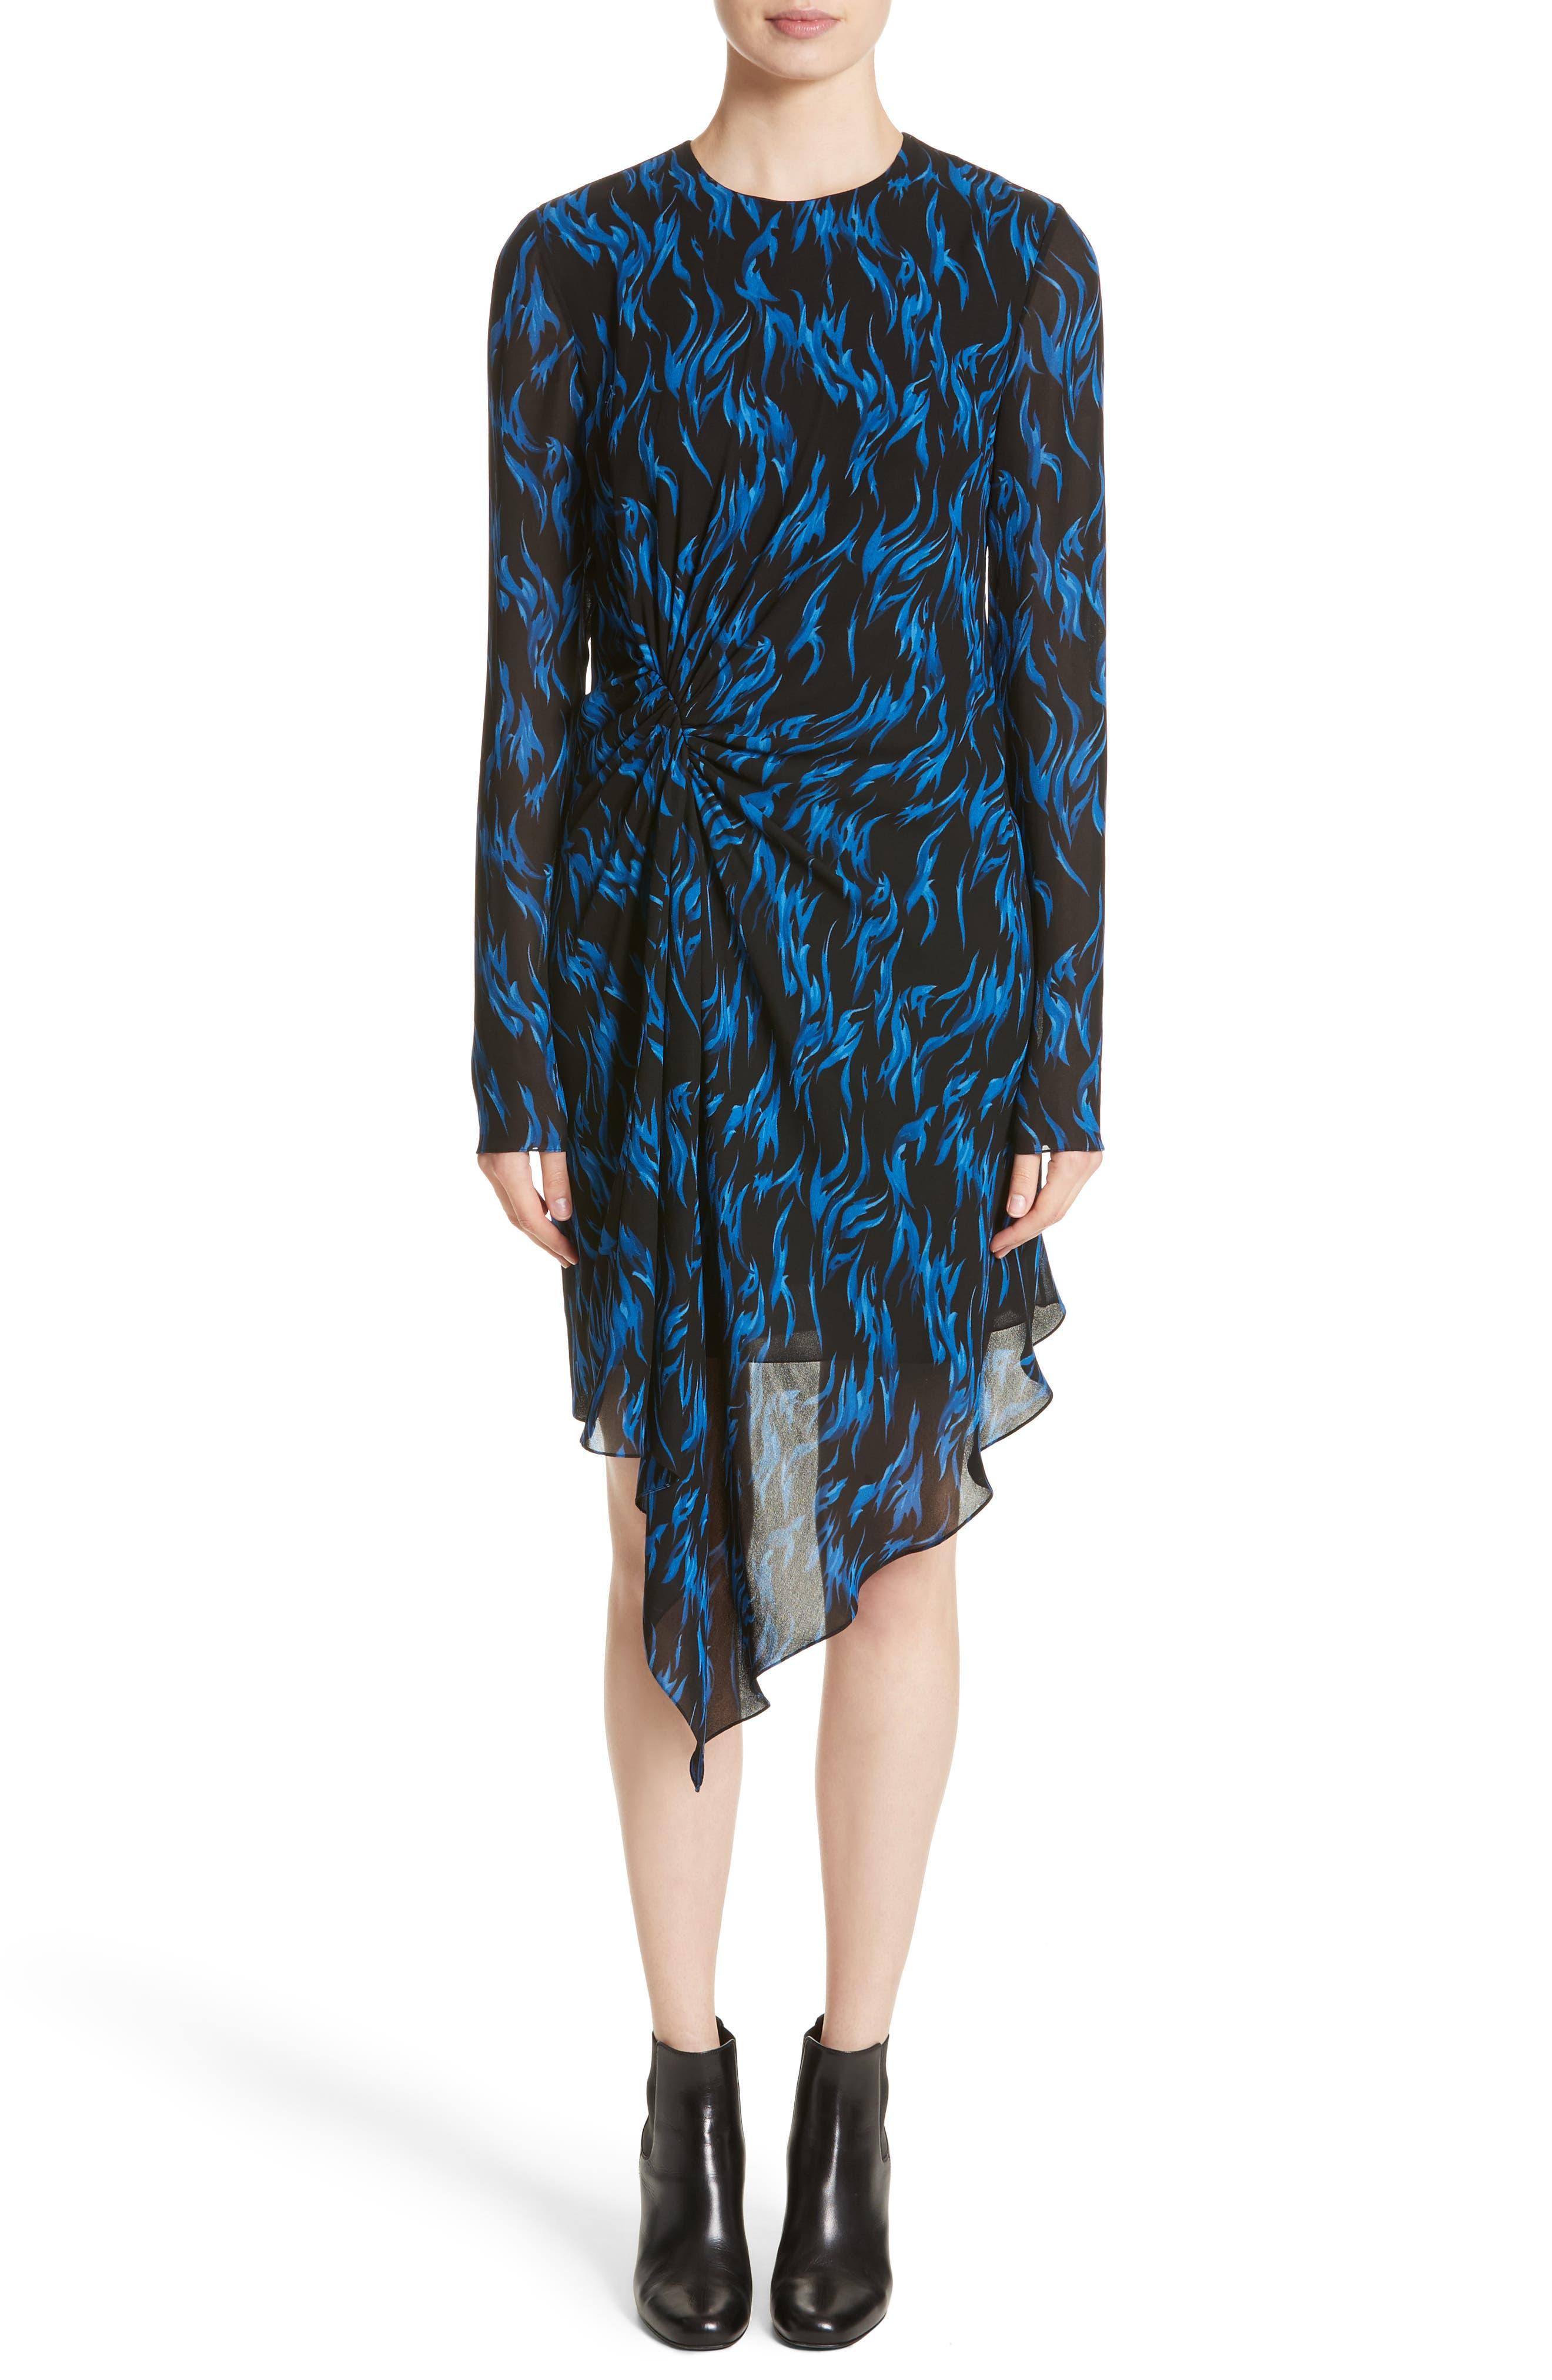 Main Image - Saint Laurent Flame Print Crepe Asymmetrical Dress